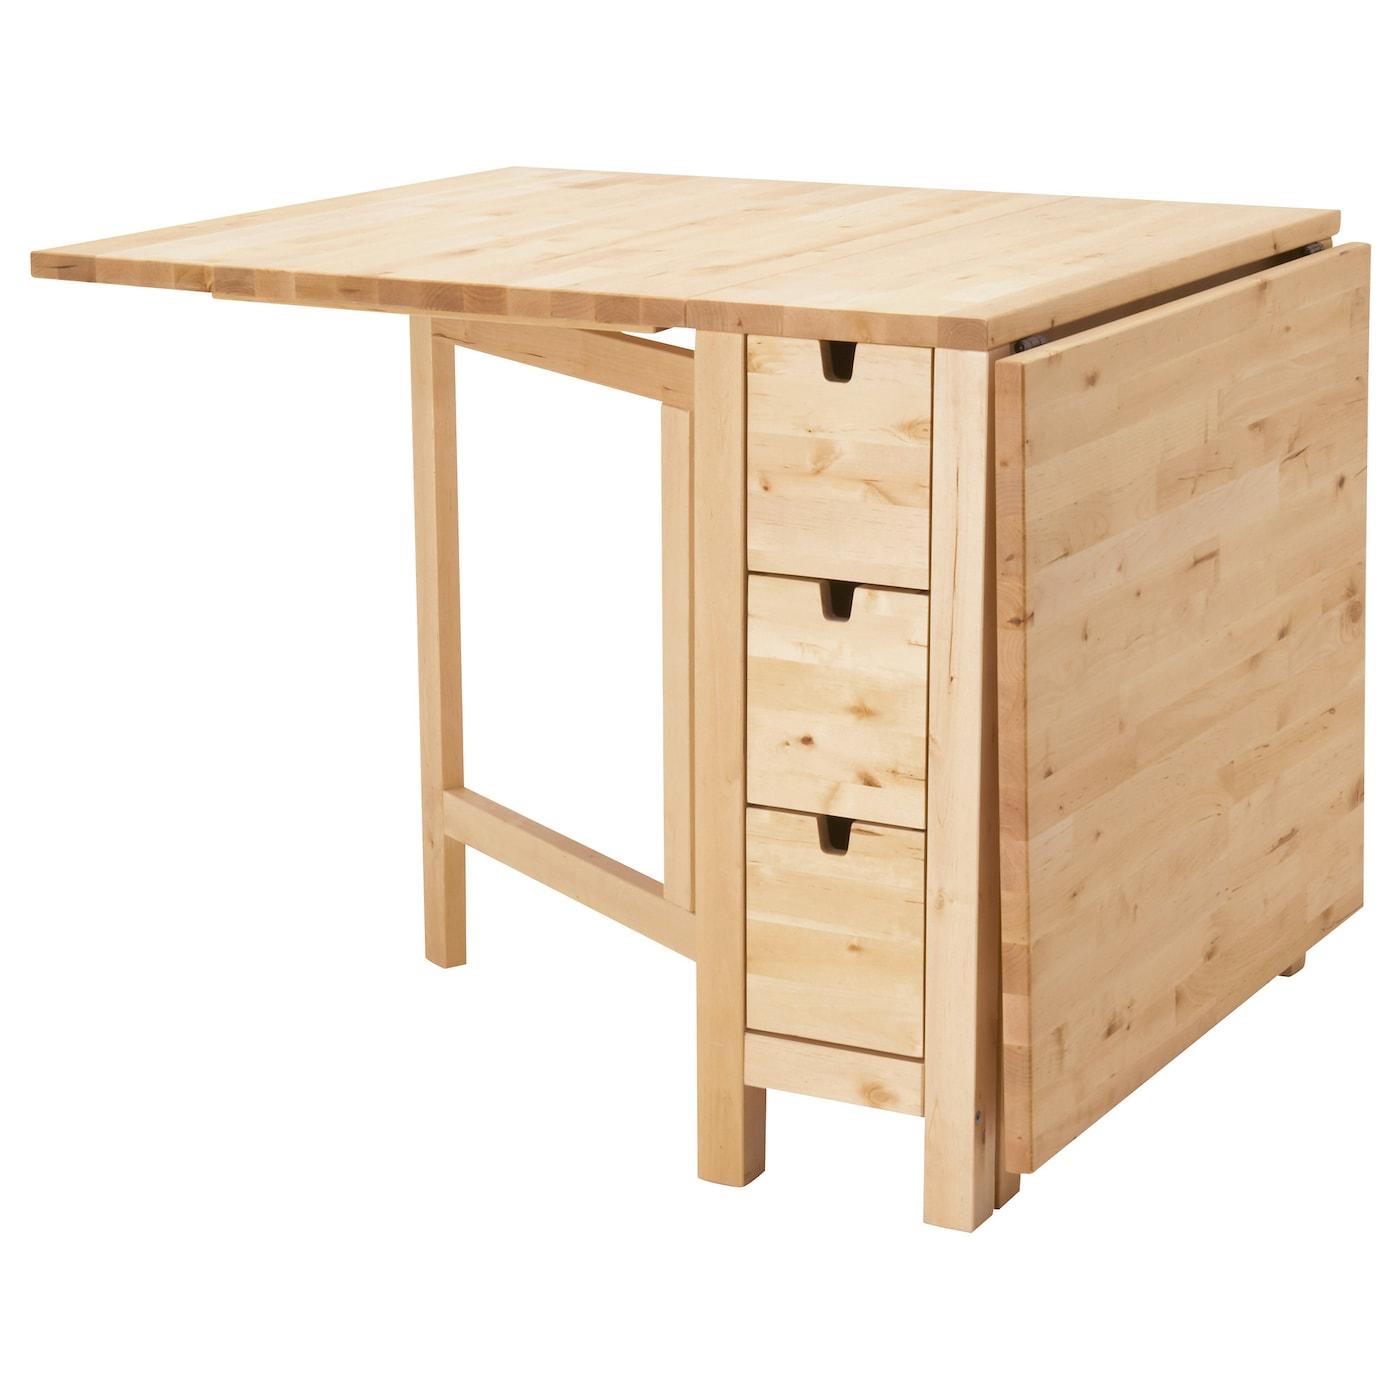 NORDEN Gateleg table - birch 12/12/12x12 cm